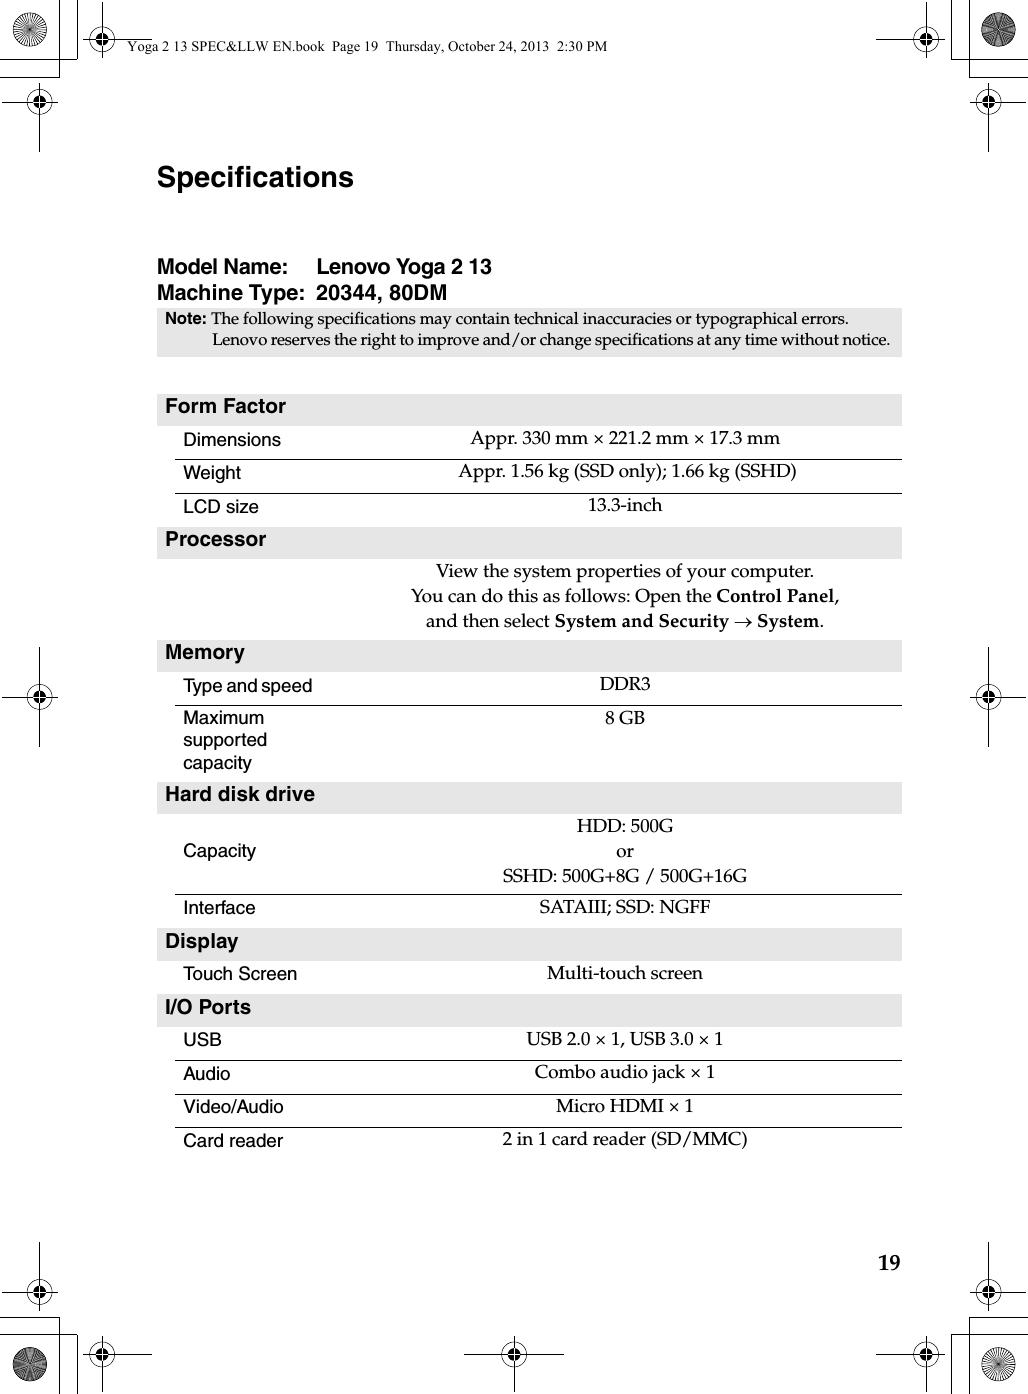 Realtek Semiconductor RTL8723BE 802 11b/g/n RTL8723BE Combo